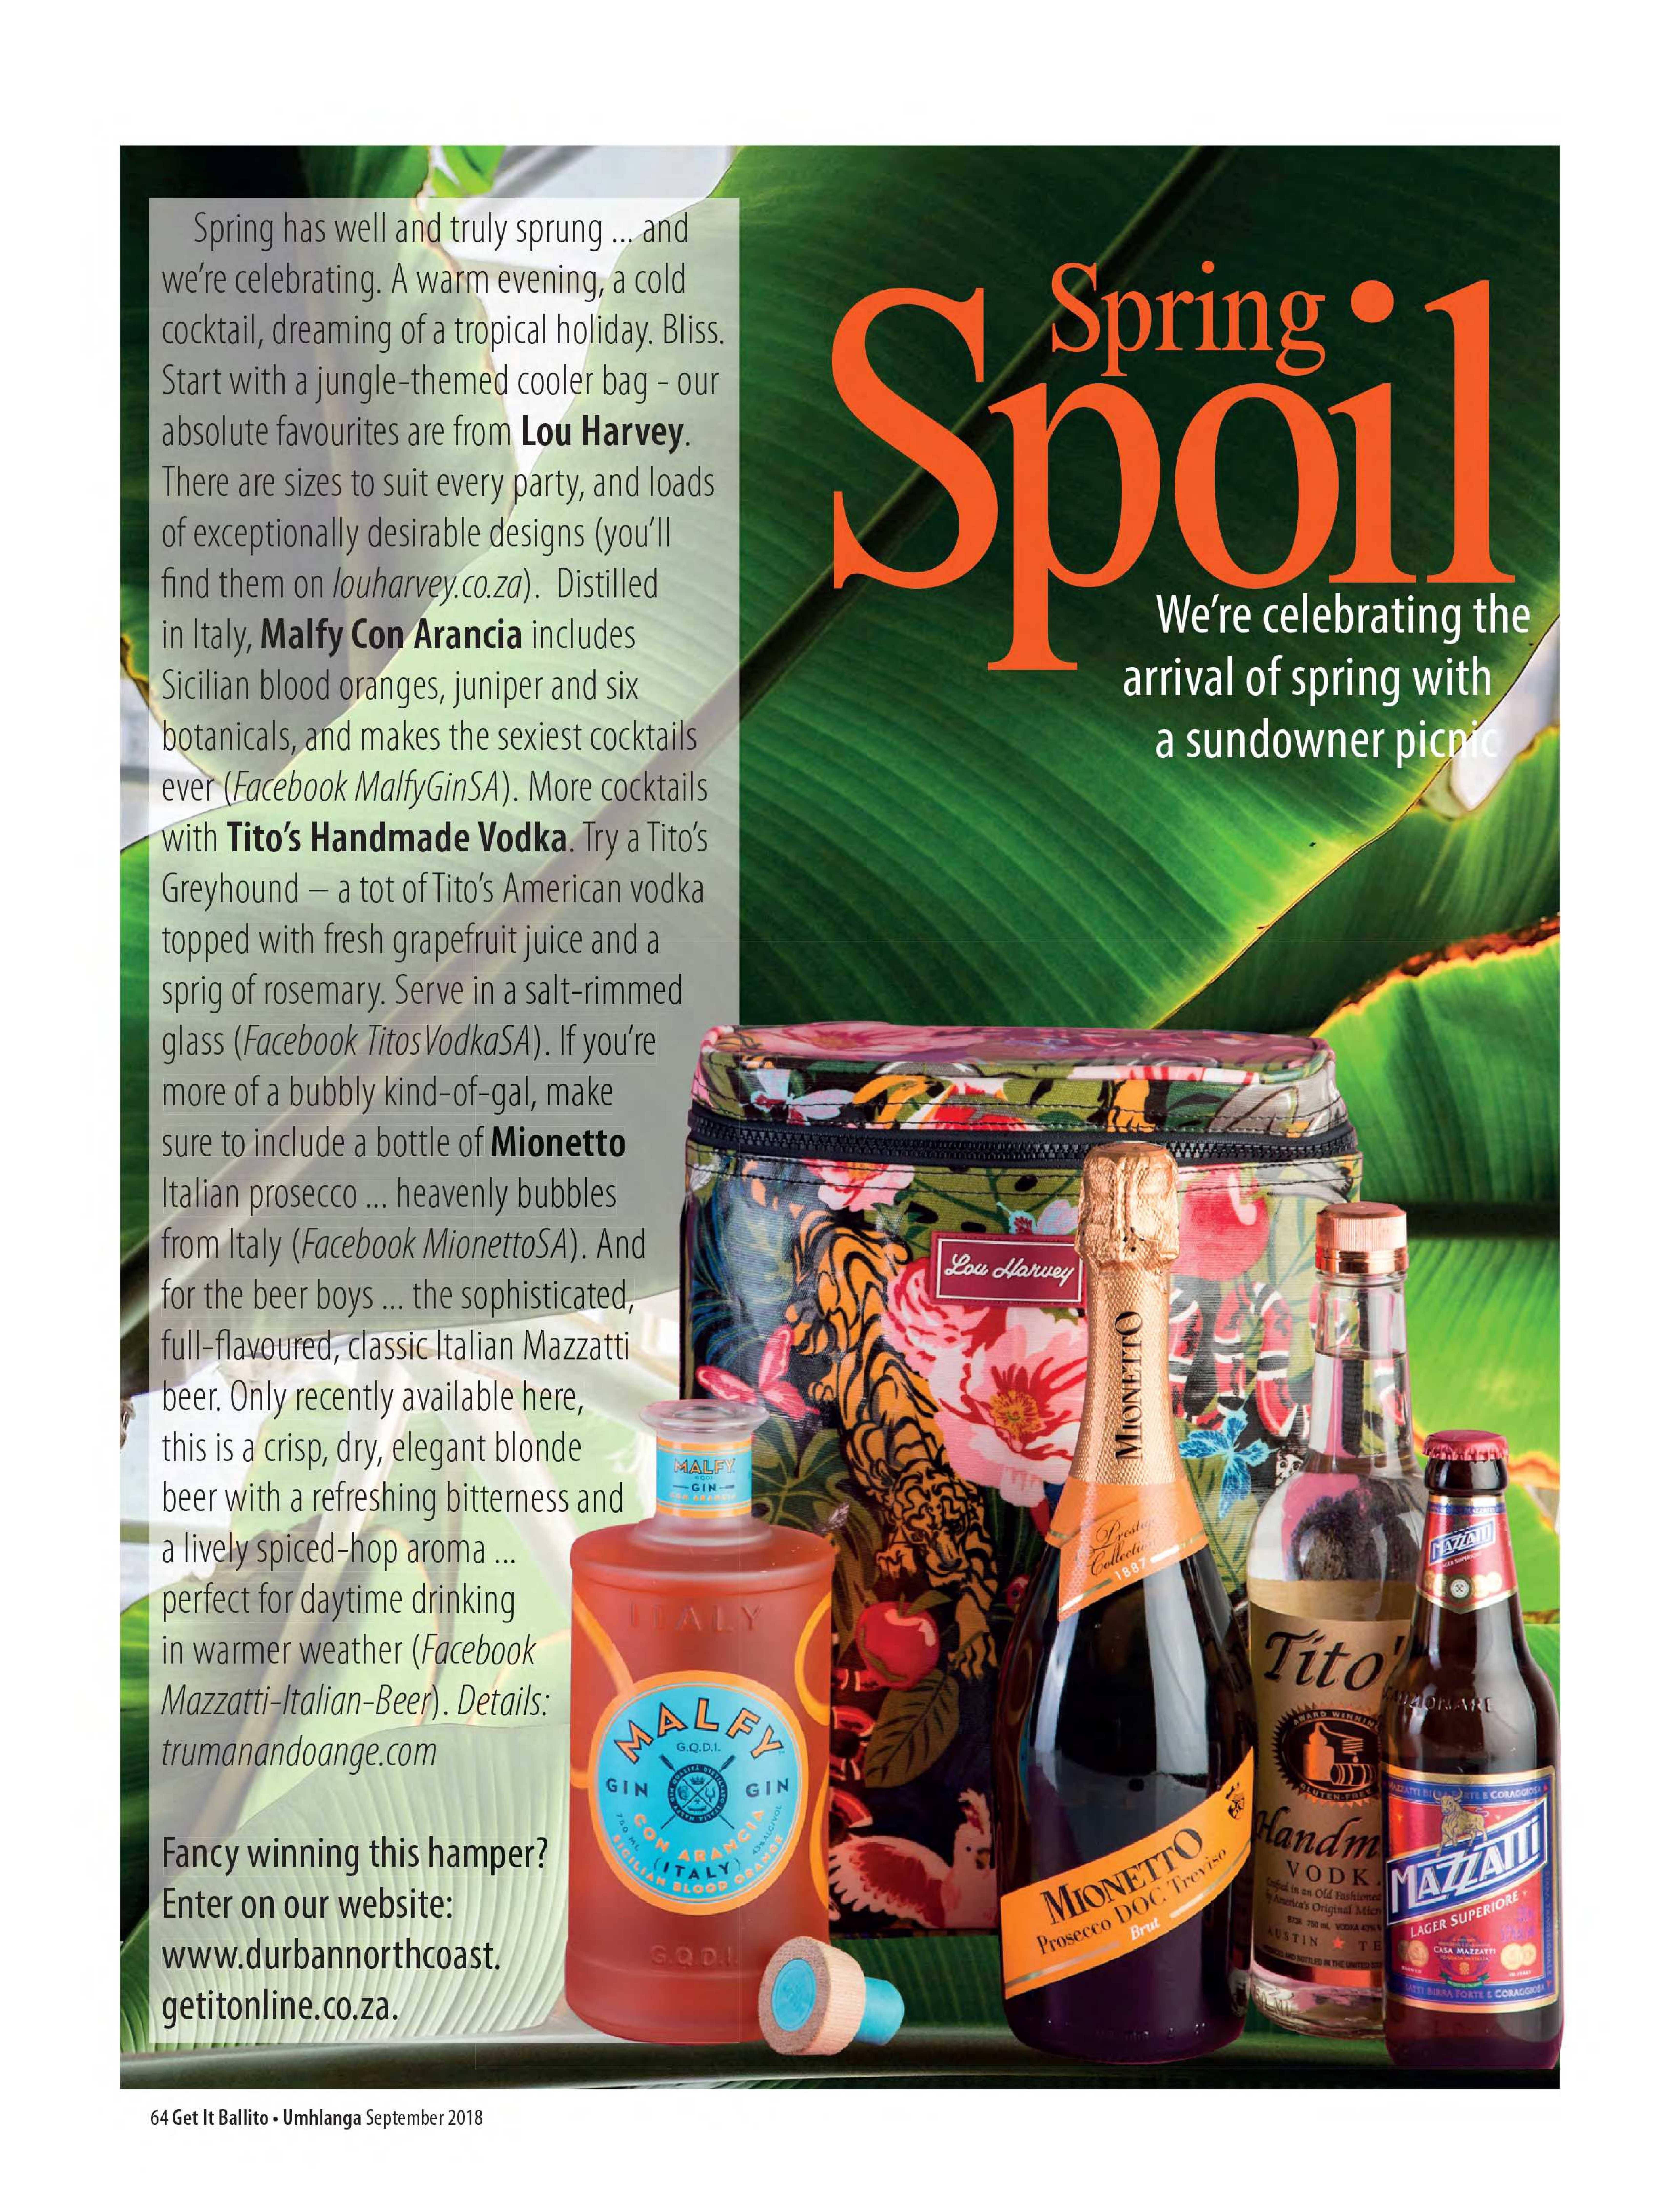 get-magazine-ballitoumhlanga-september-2018-epapers-page-66